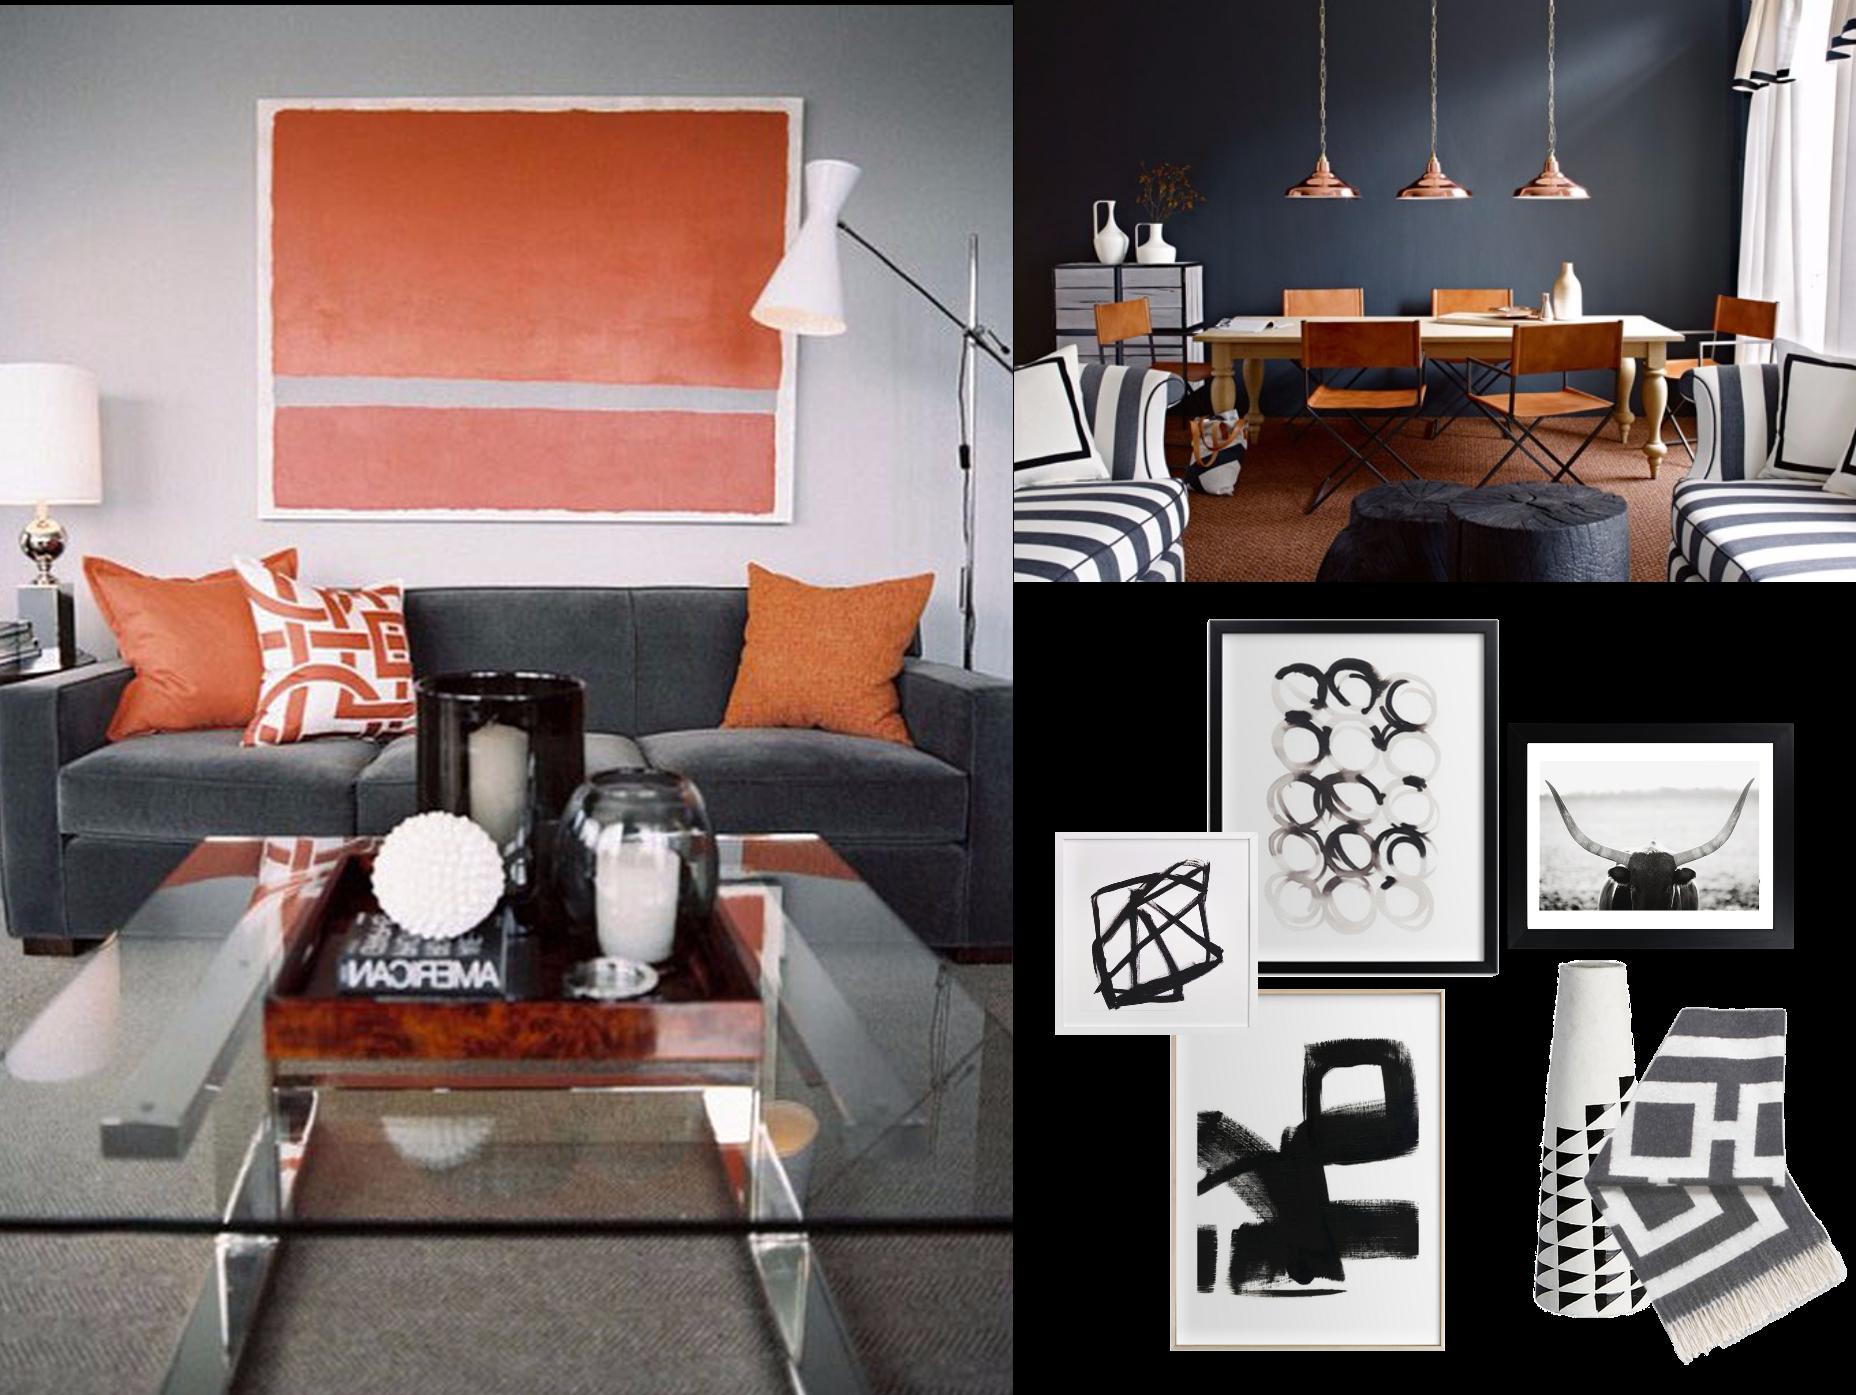 Gray Sofa Tiger Print Area Rug Dark Gray Walls And Rust Orange Curtains Yes Or No Orange Curtains Grey Walls Gray Sofa